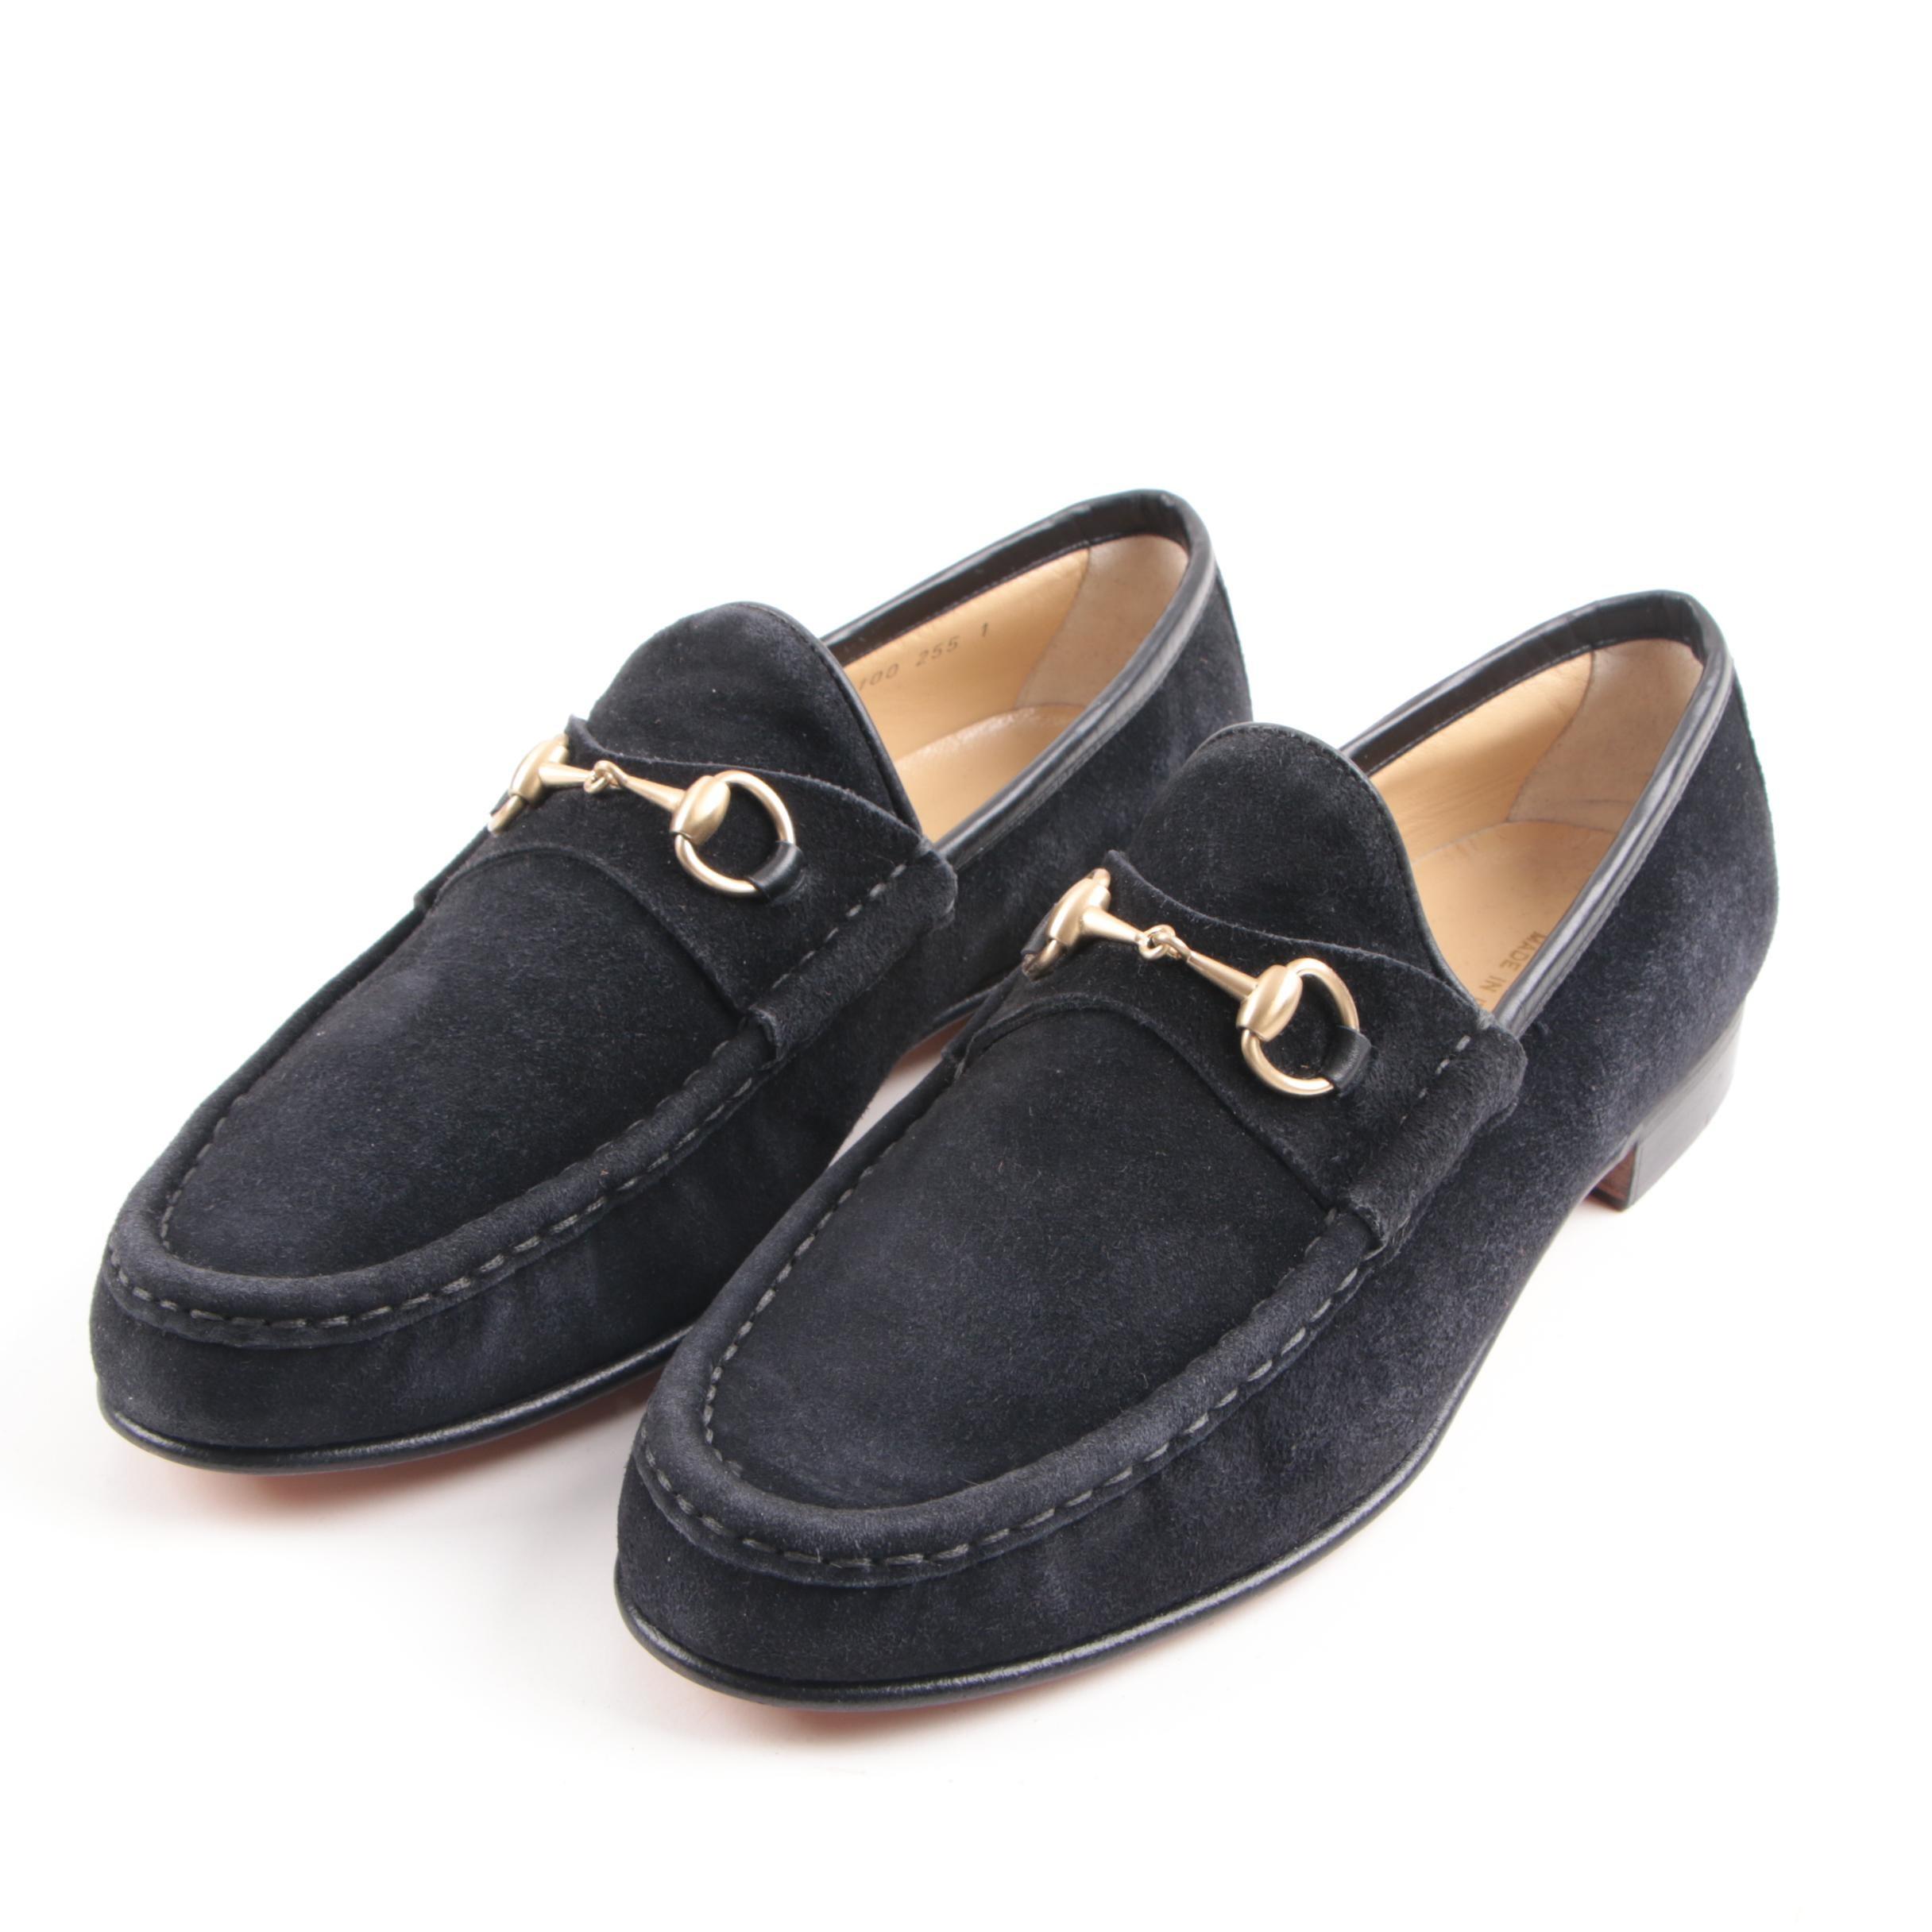 Women's Gucci Black Suede Horsebit Loafers